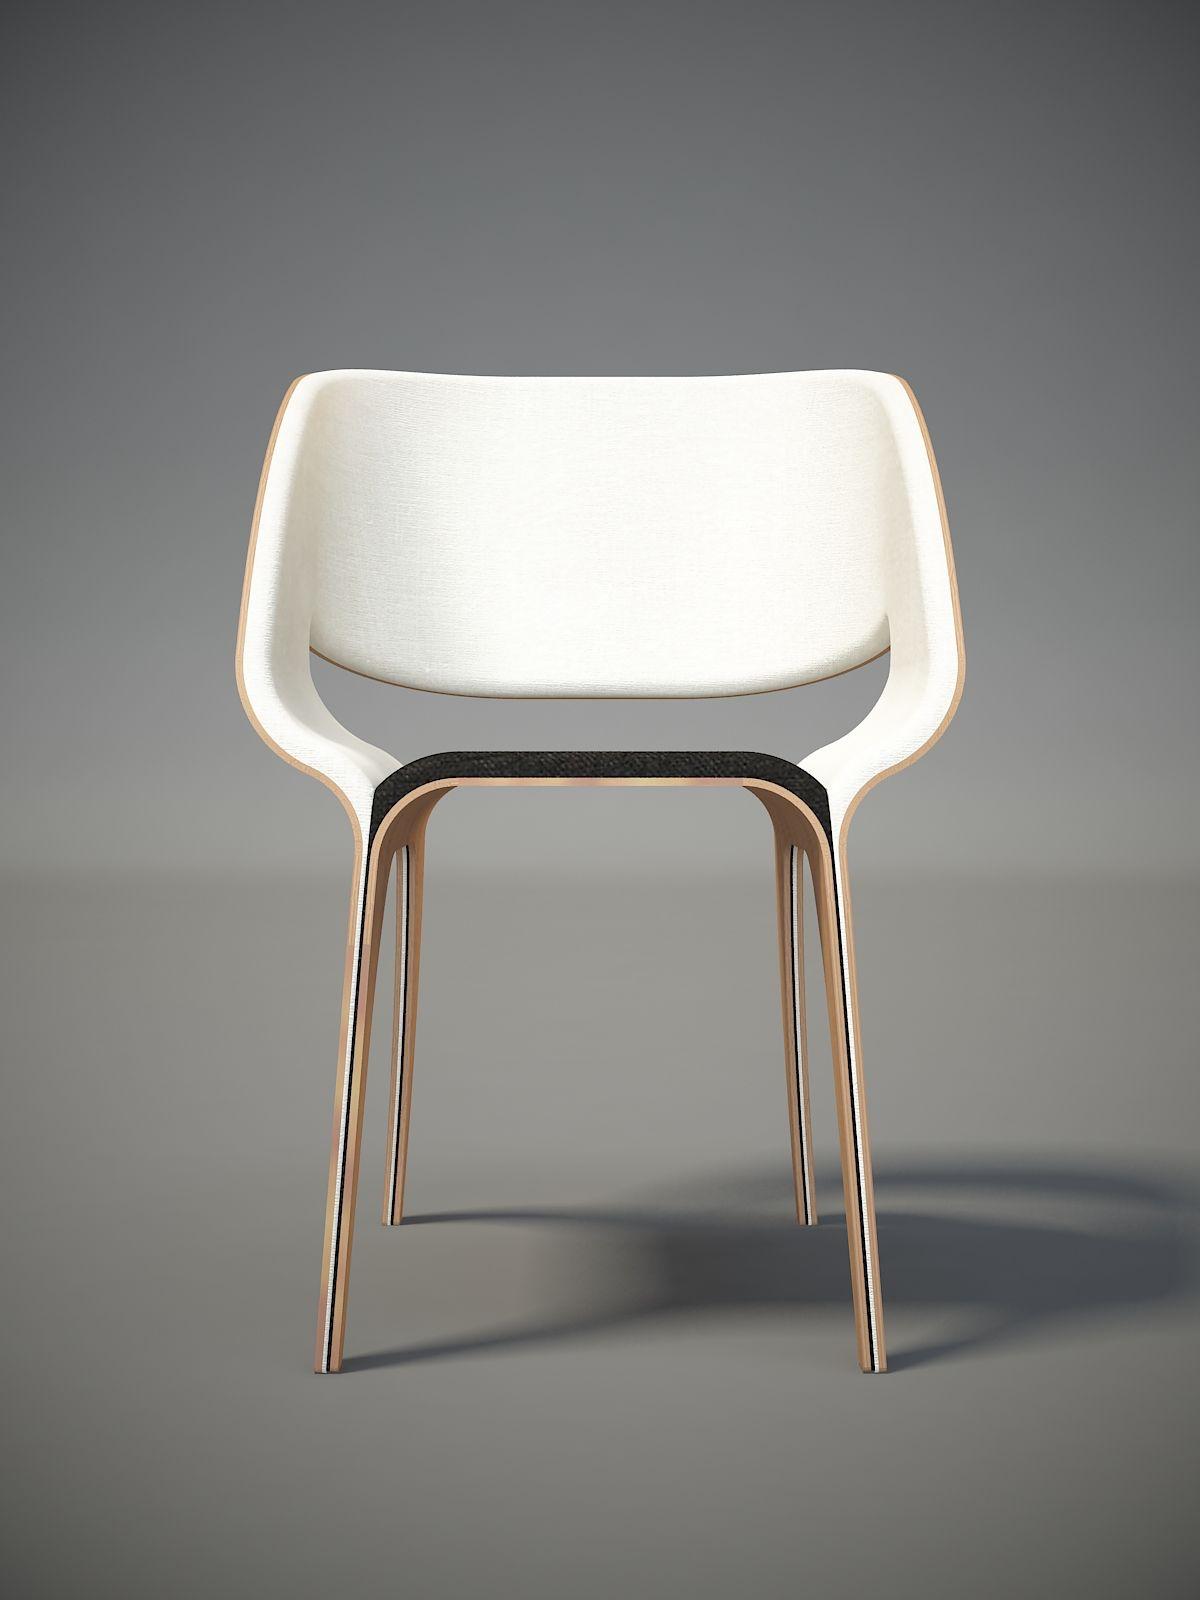 Produktdesign Möbel siя chair concept design pin it mundodascasas veja mais aqui see